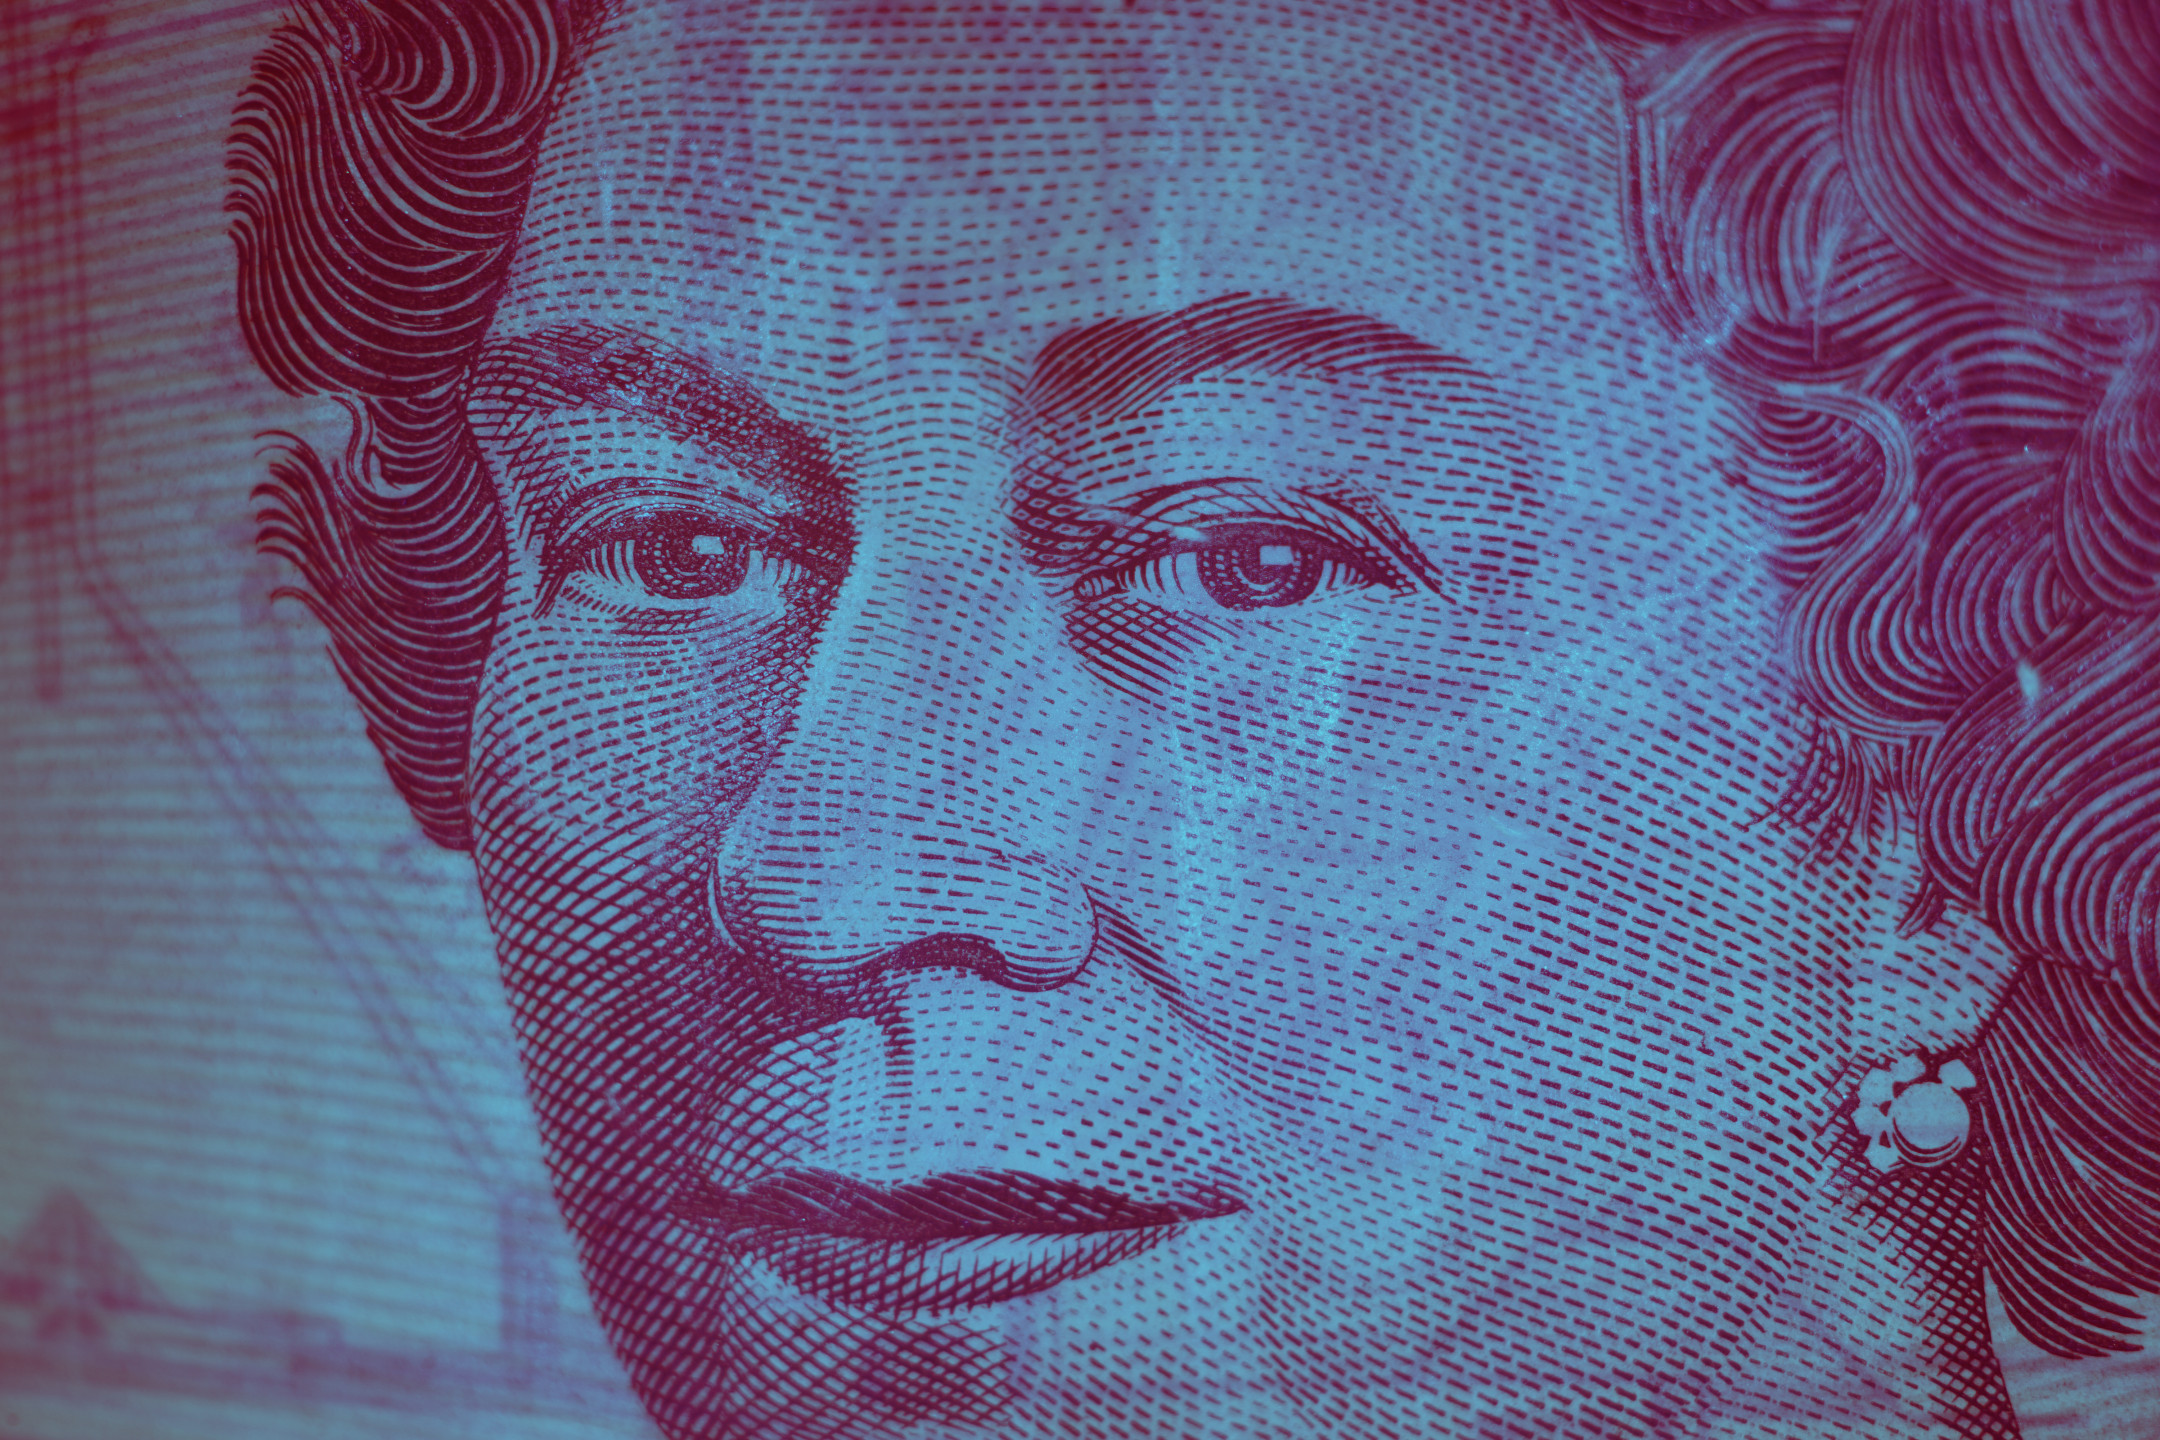 Australian dollar declines after RBA rate cuts signal